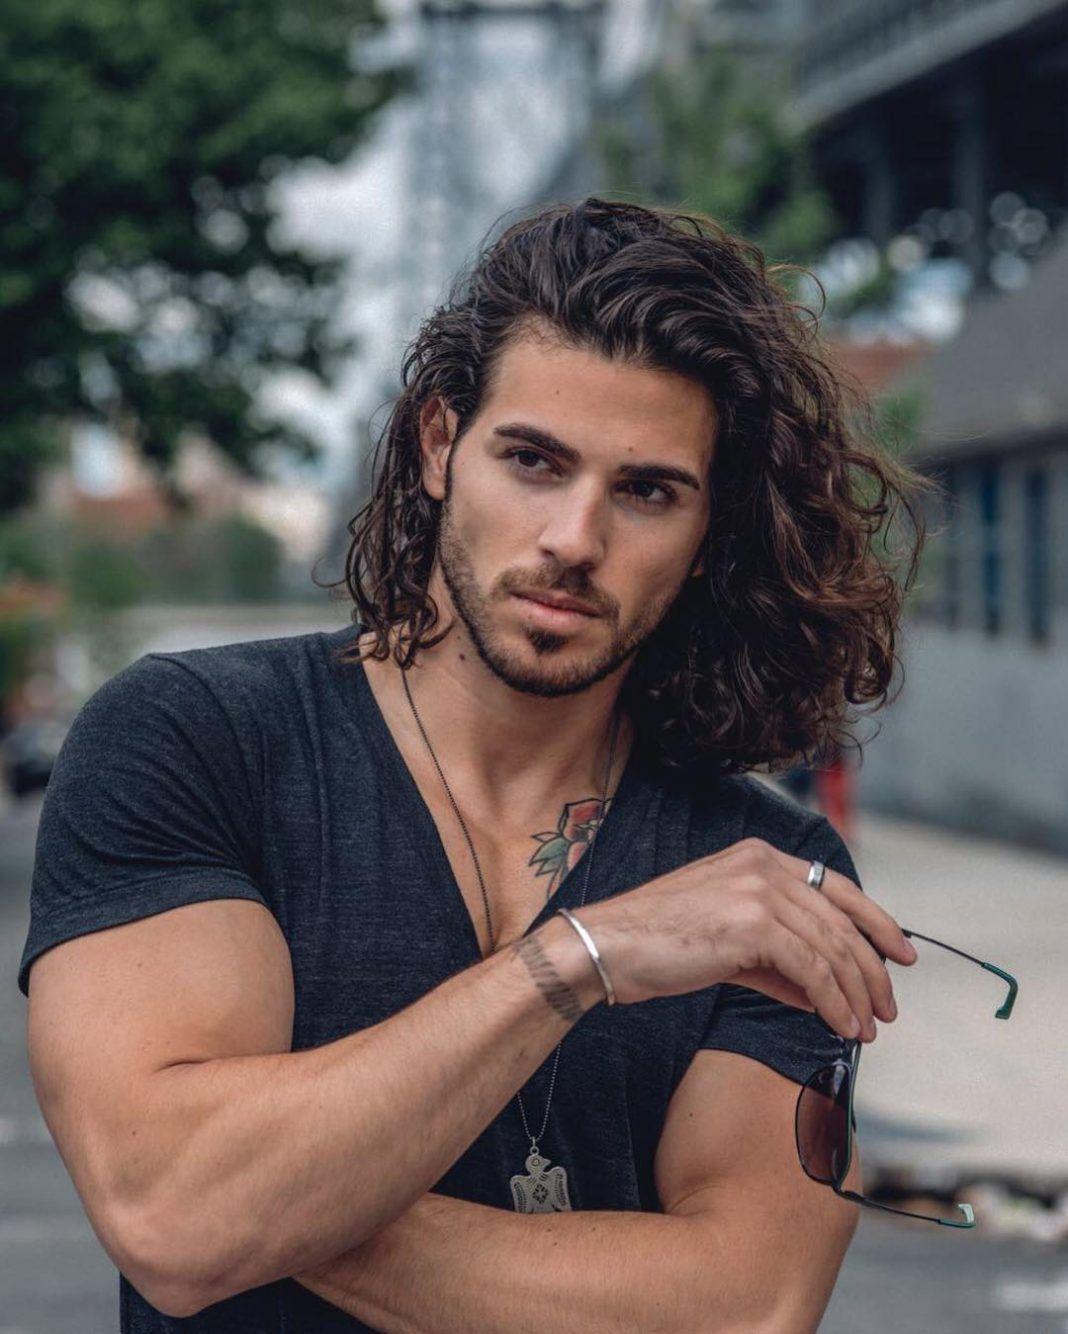 40 Coiffures pour cheveux longs et mi-longs | Guy haircuts long, Wavy hair men, Long hair styles